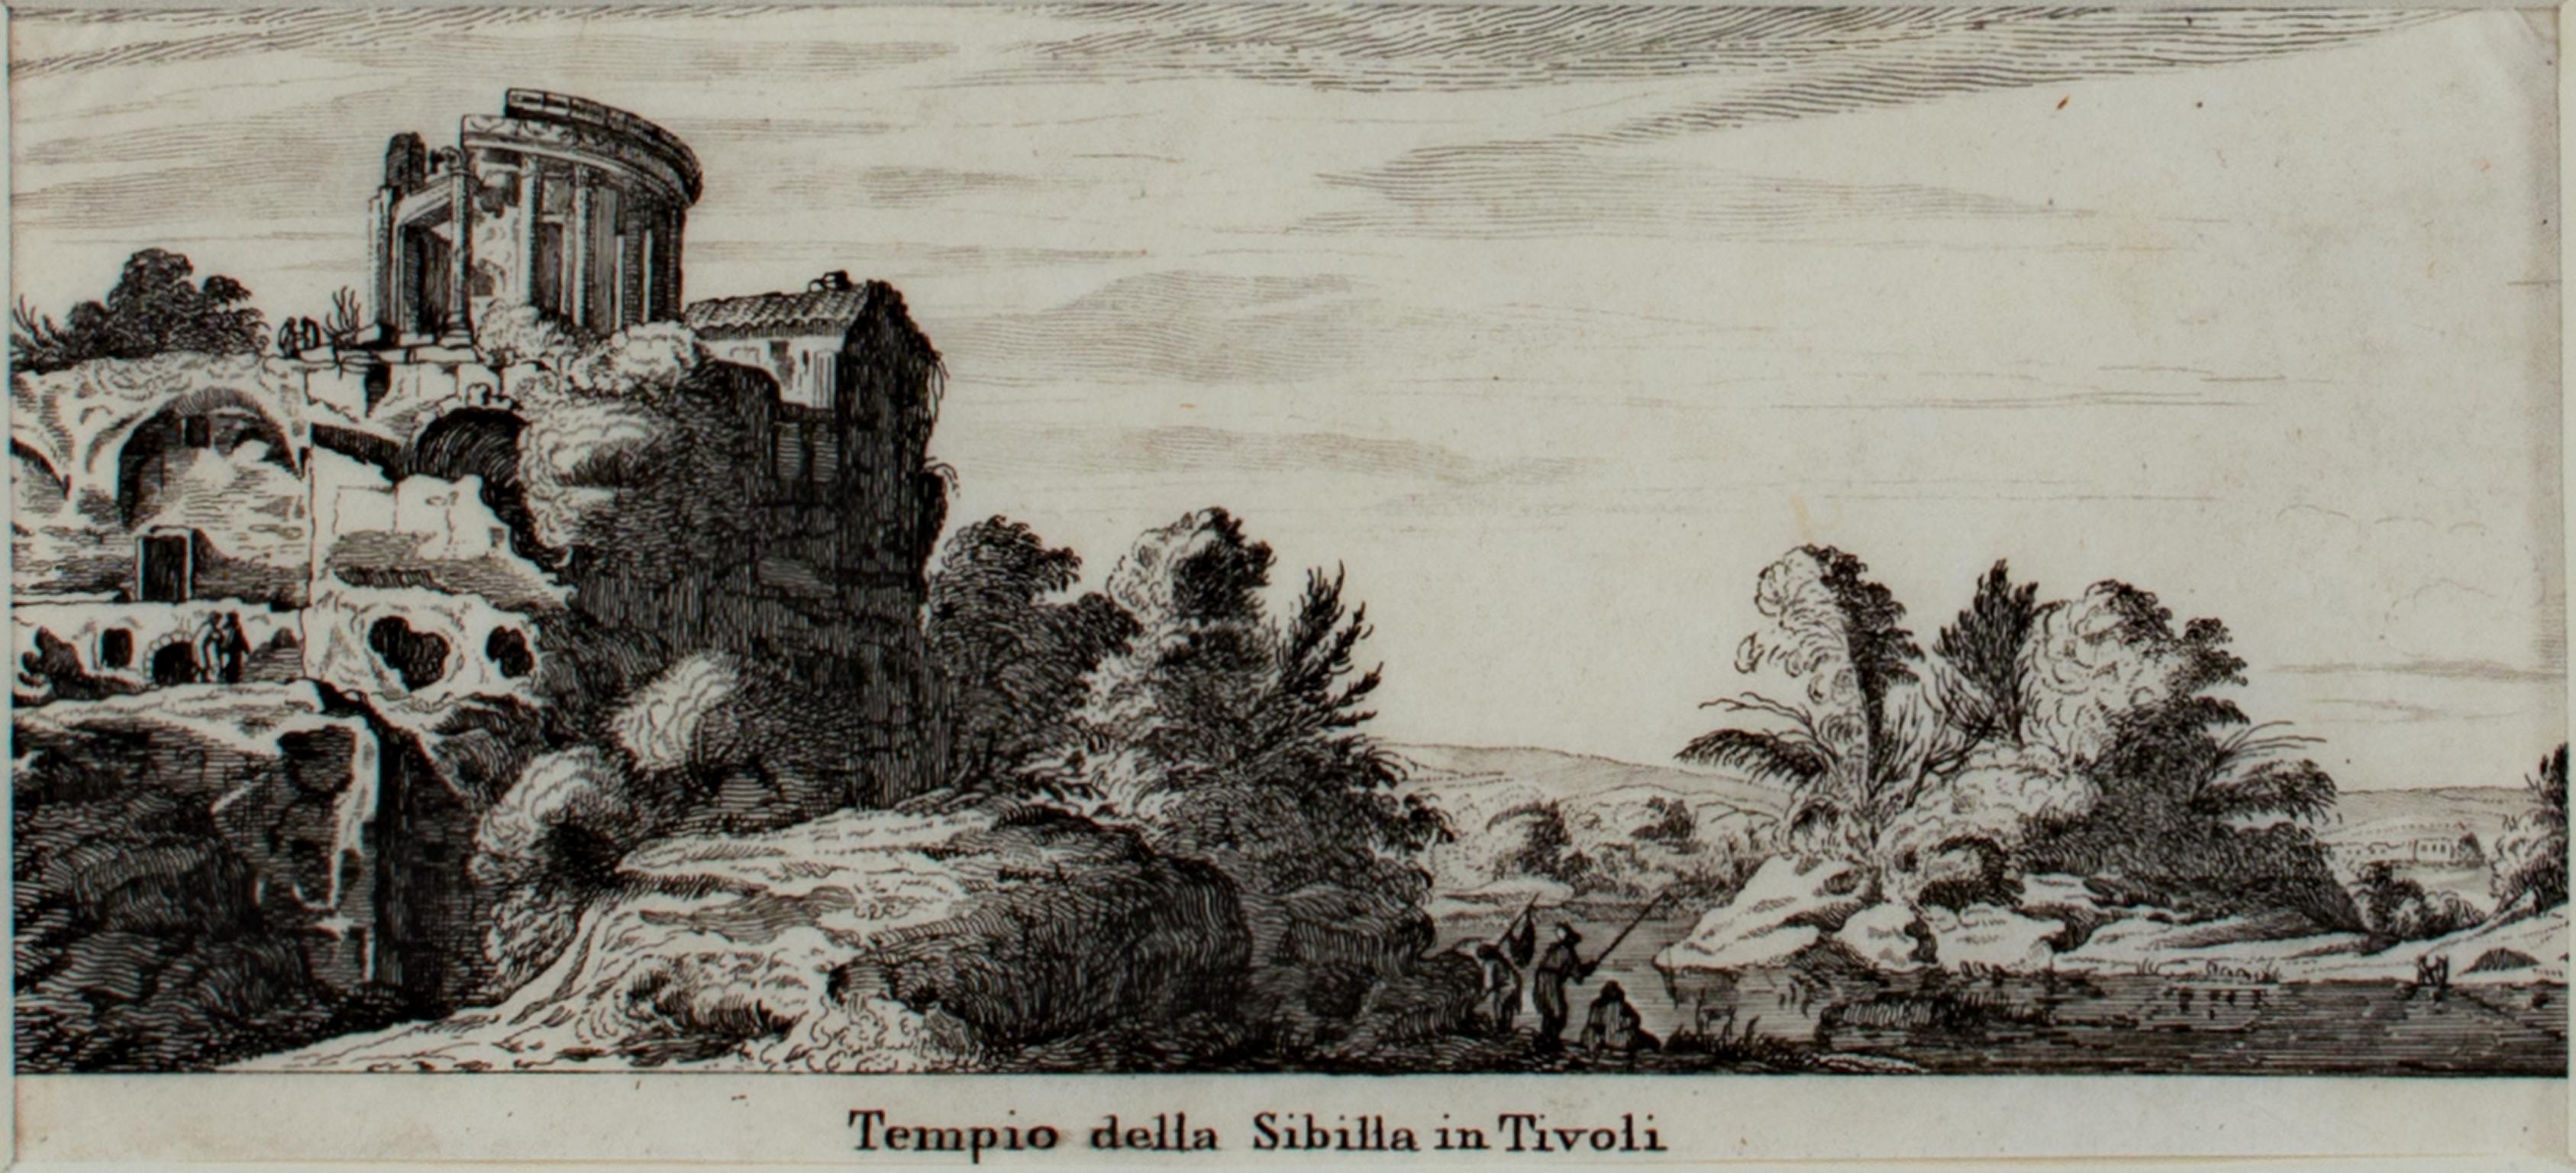 """Tempio della Sibilla in Tivoli,"" Original Engraving by Israel Silvestre"